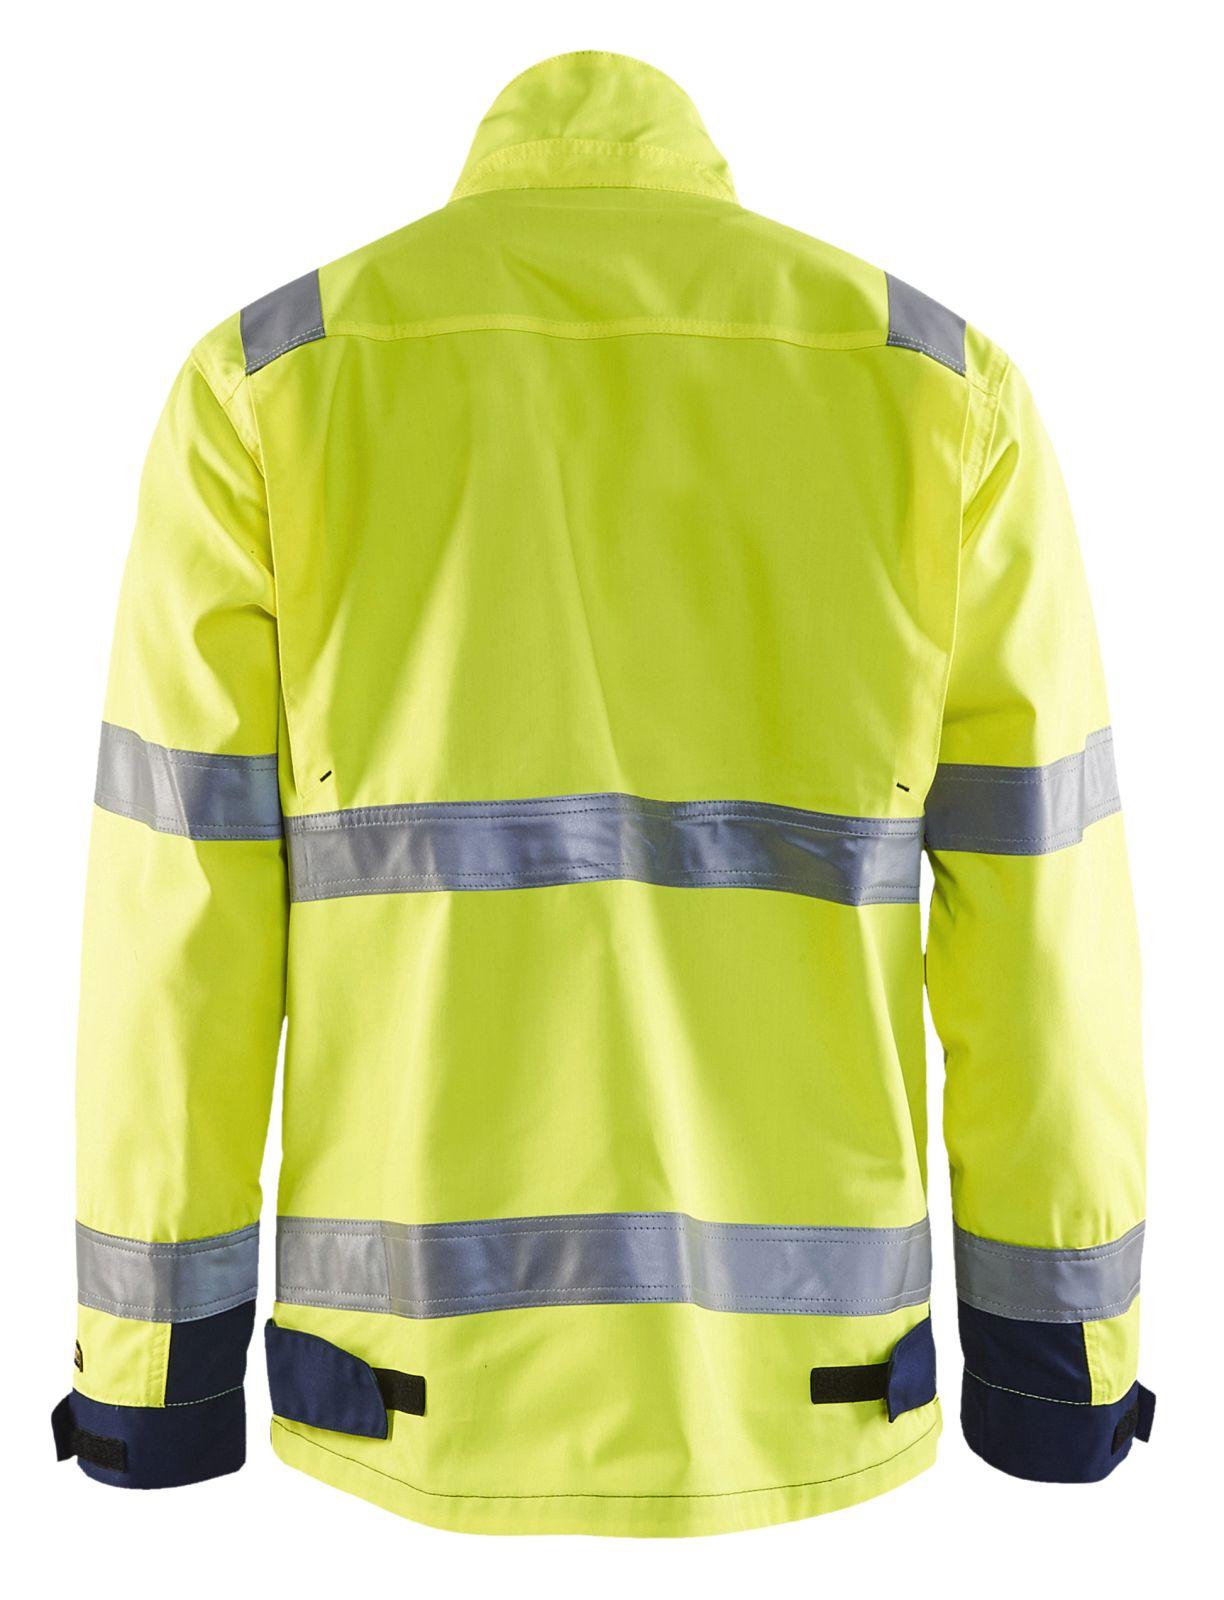 Blaklader Combi-jacks 40641811 High Vis geel-marineblauw(3389)